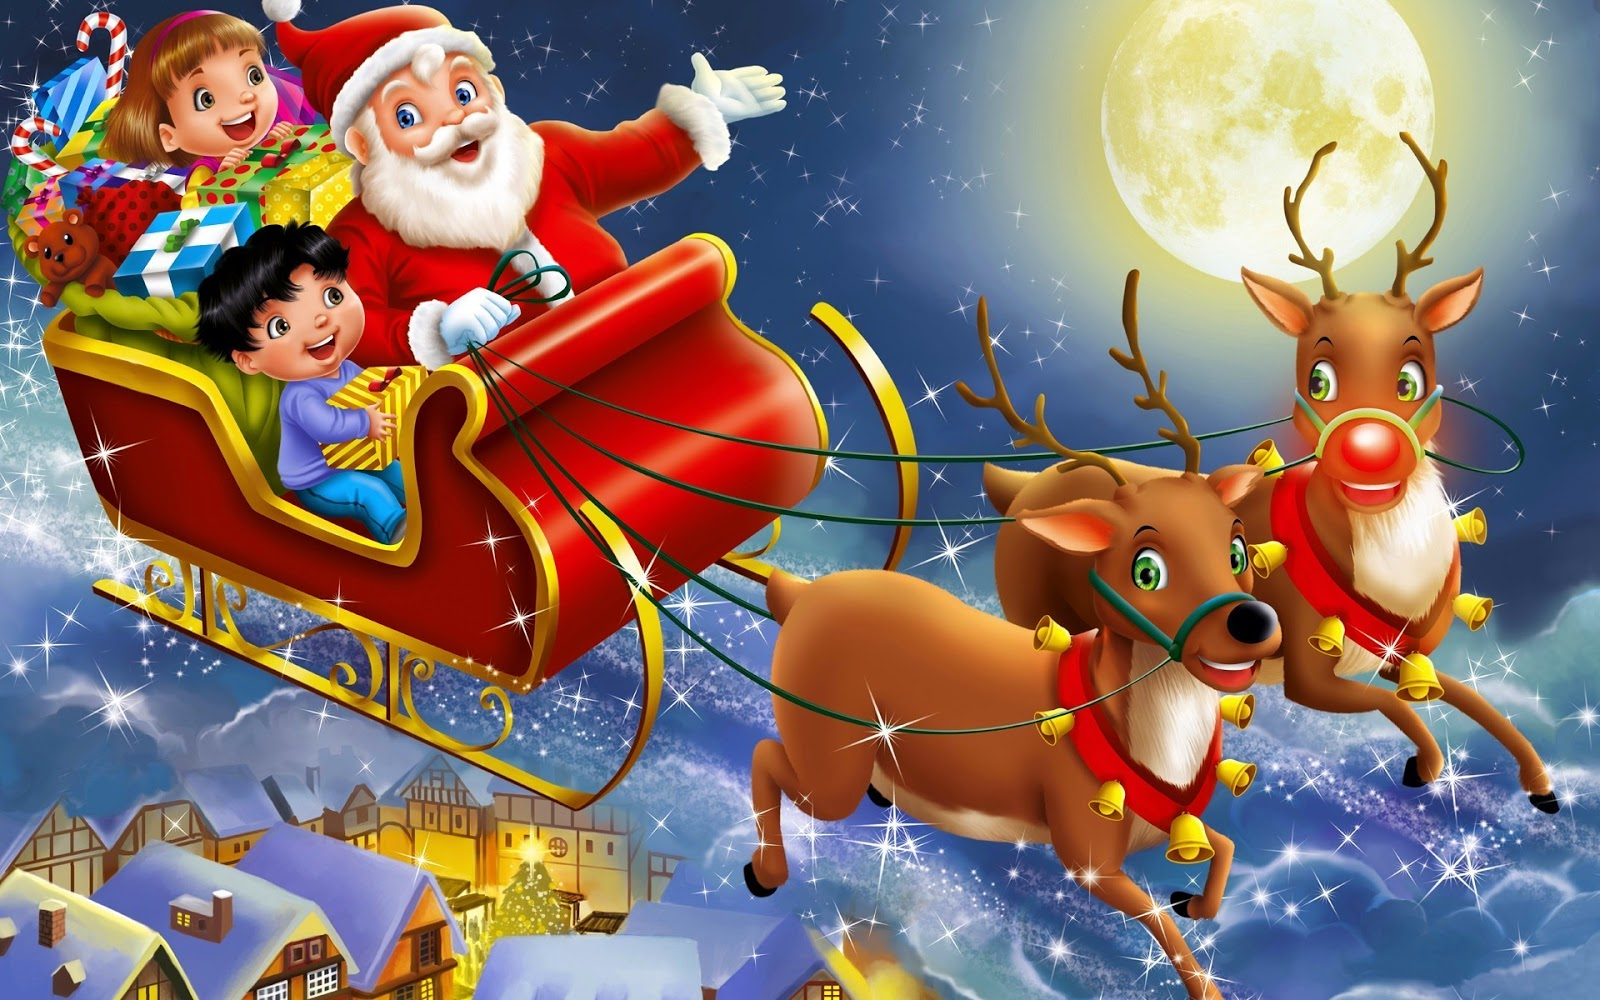 santa-claus-riding-his-sleigh-reindeer-with-kids-in-sky-HD-wallpaper.jpg